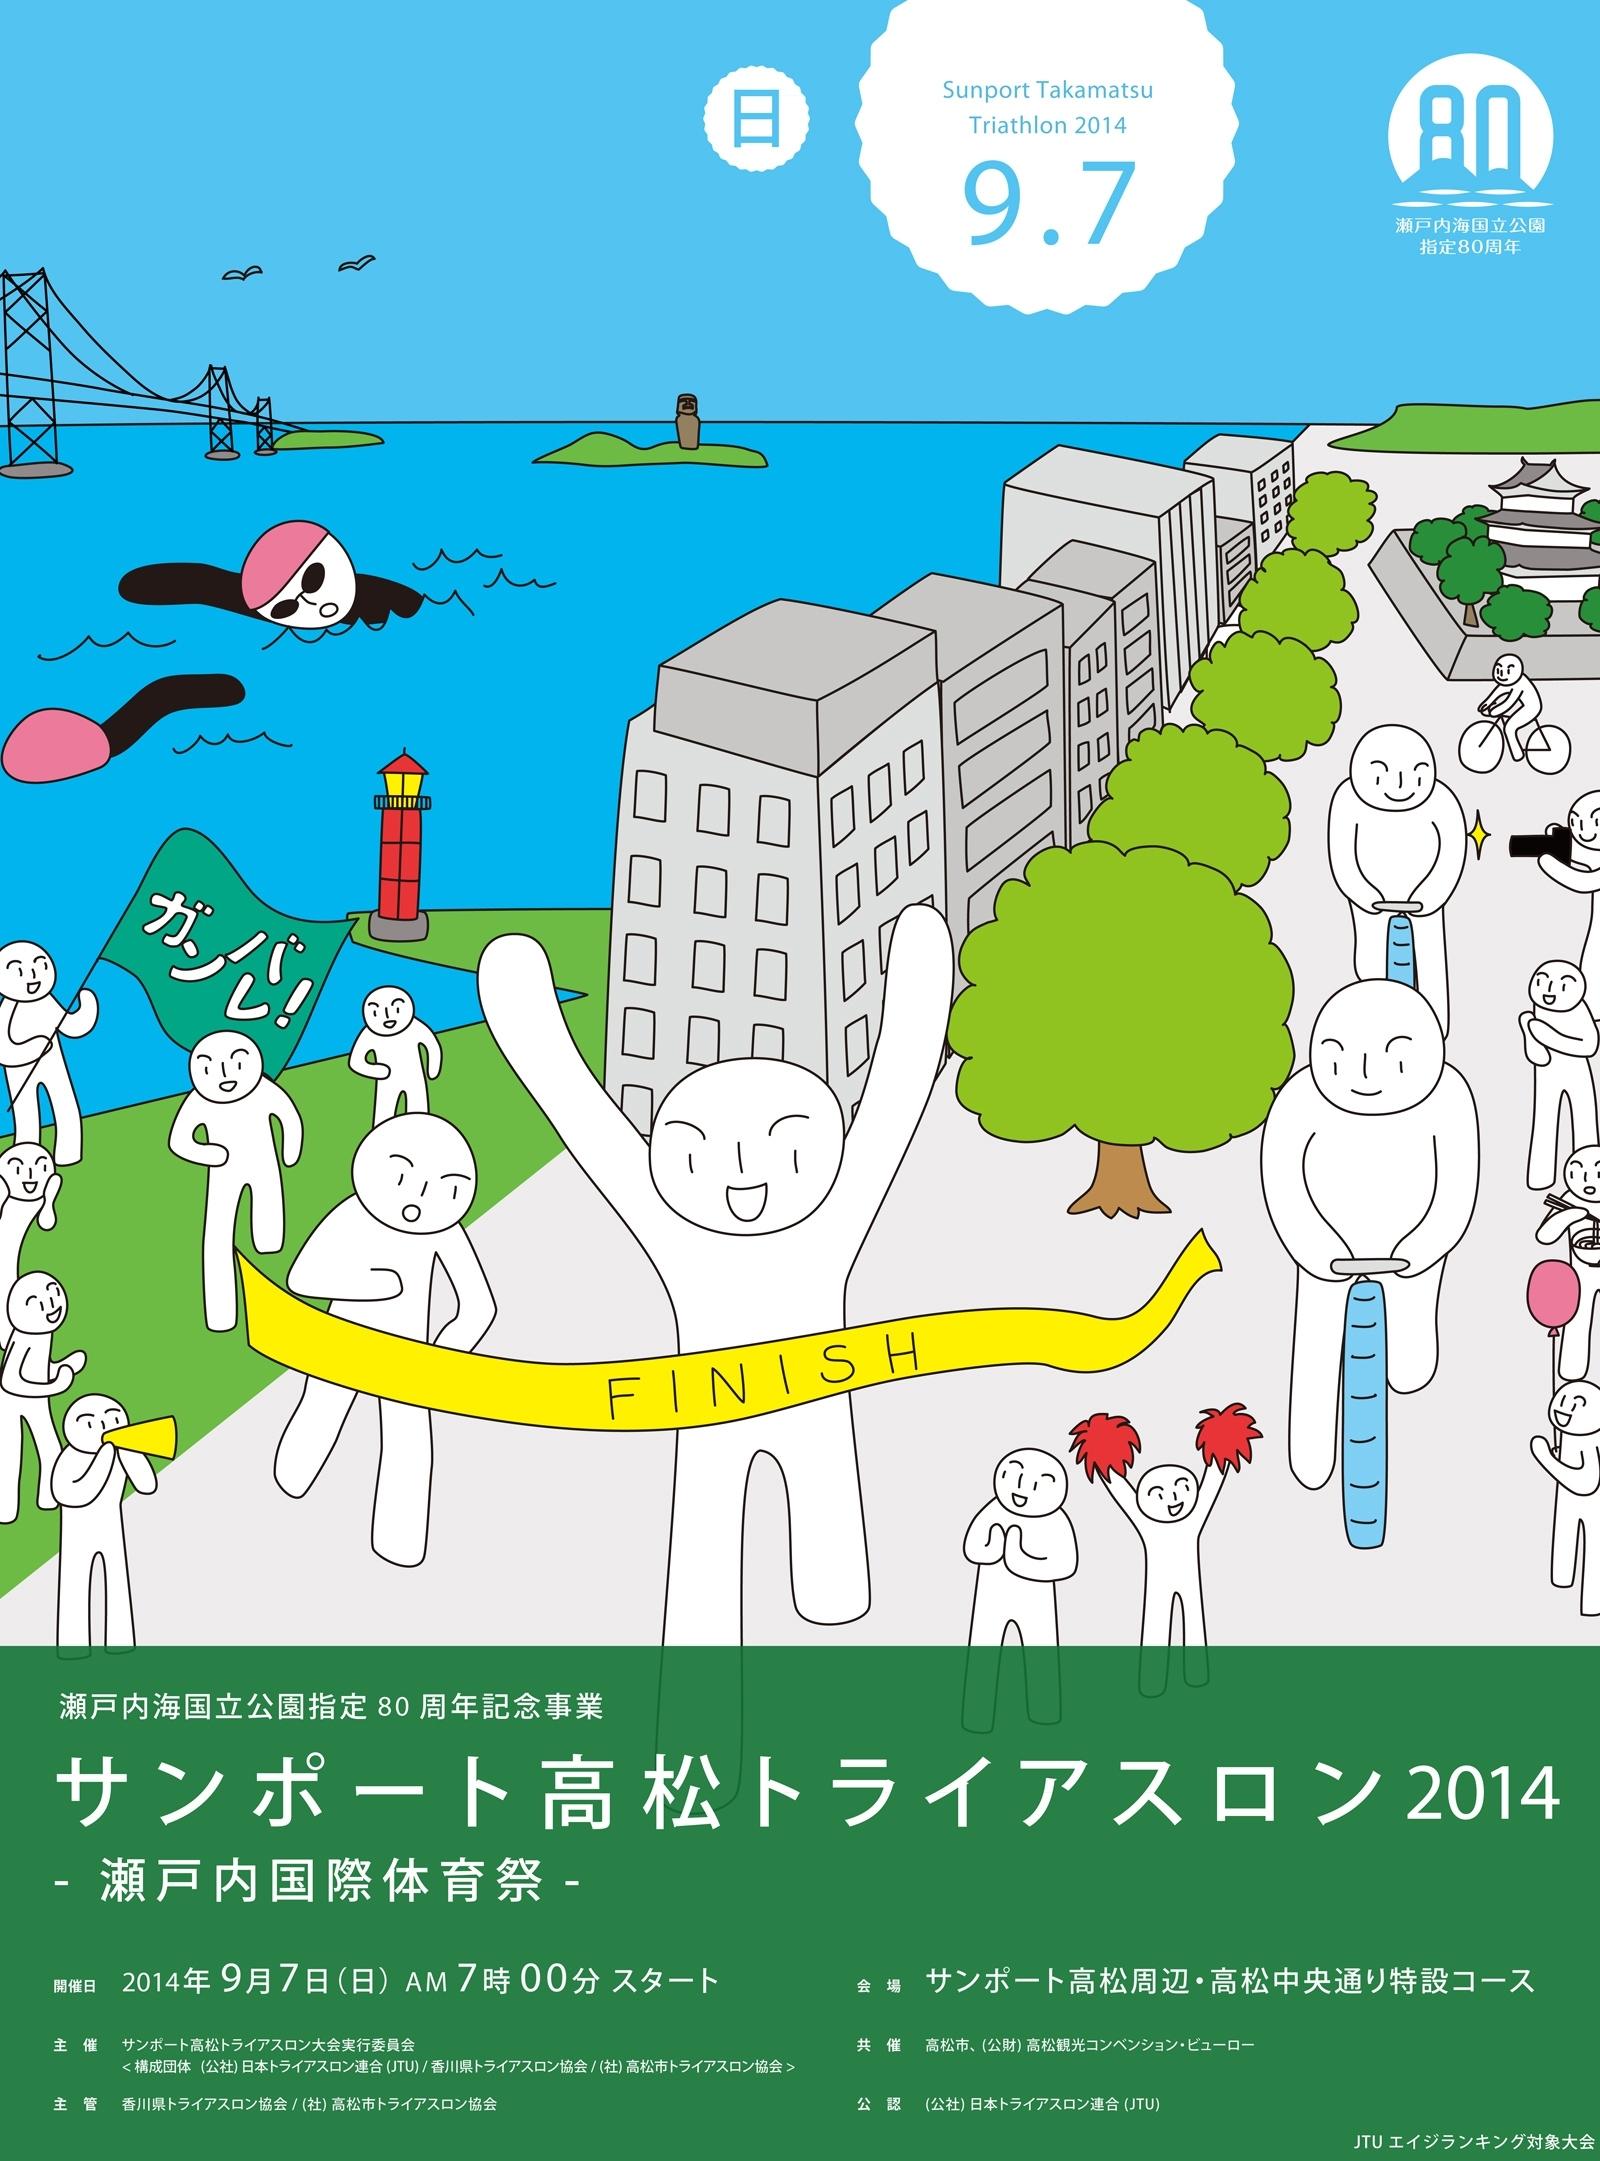 takamatsu_poster_2014_1600